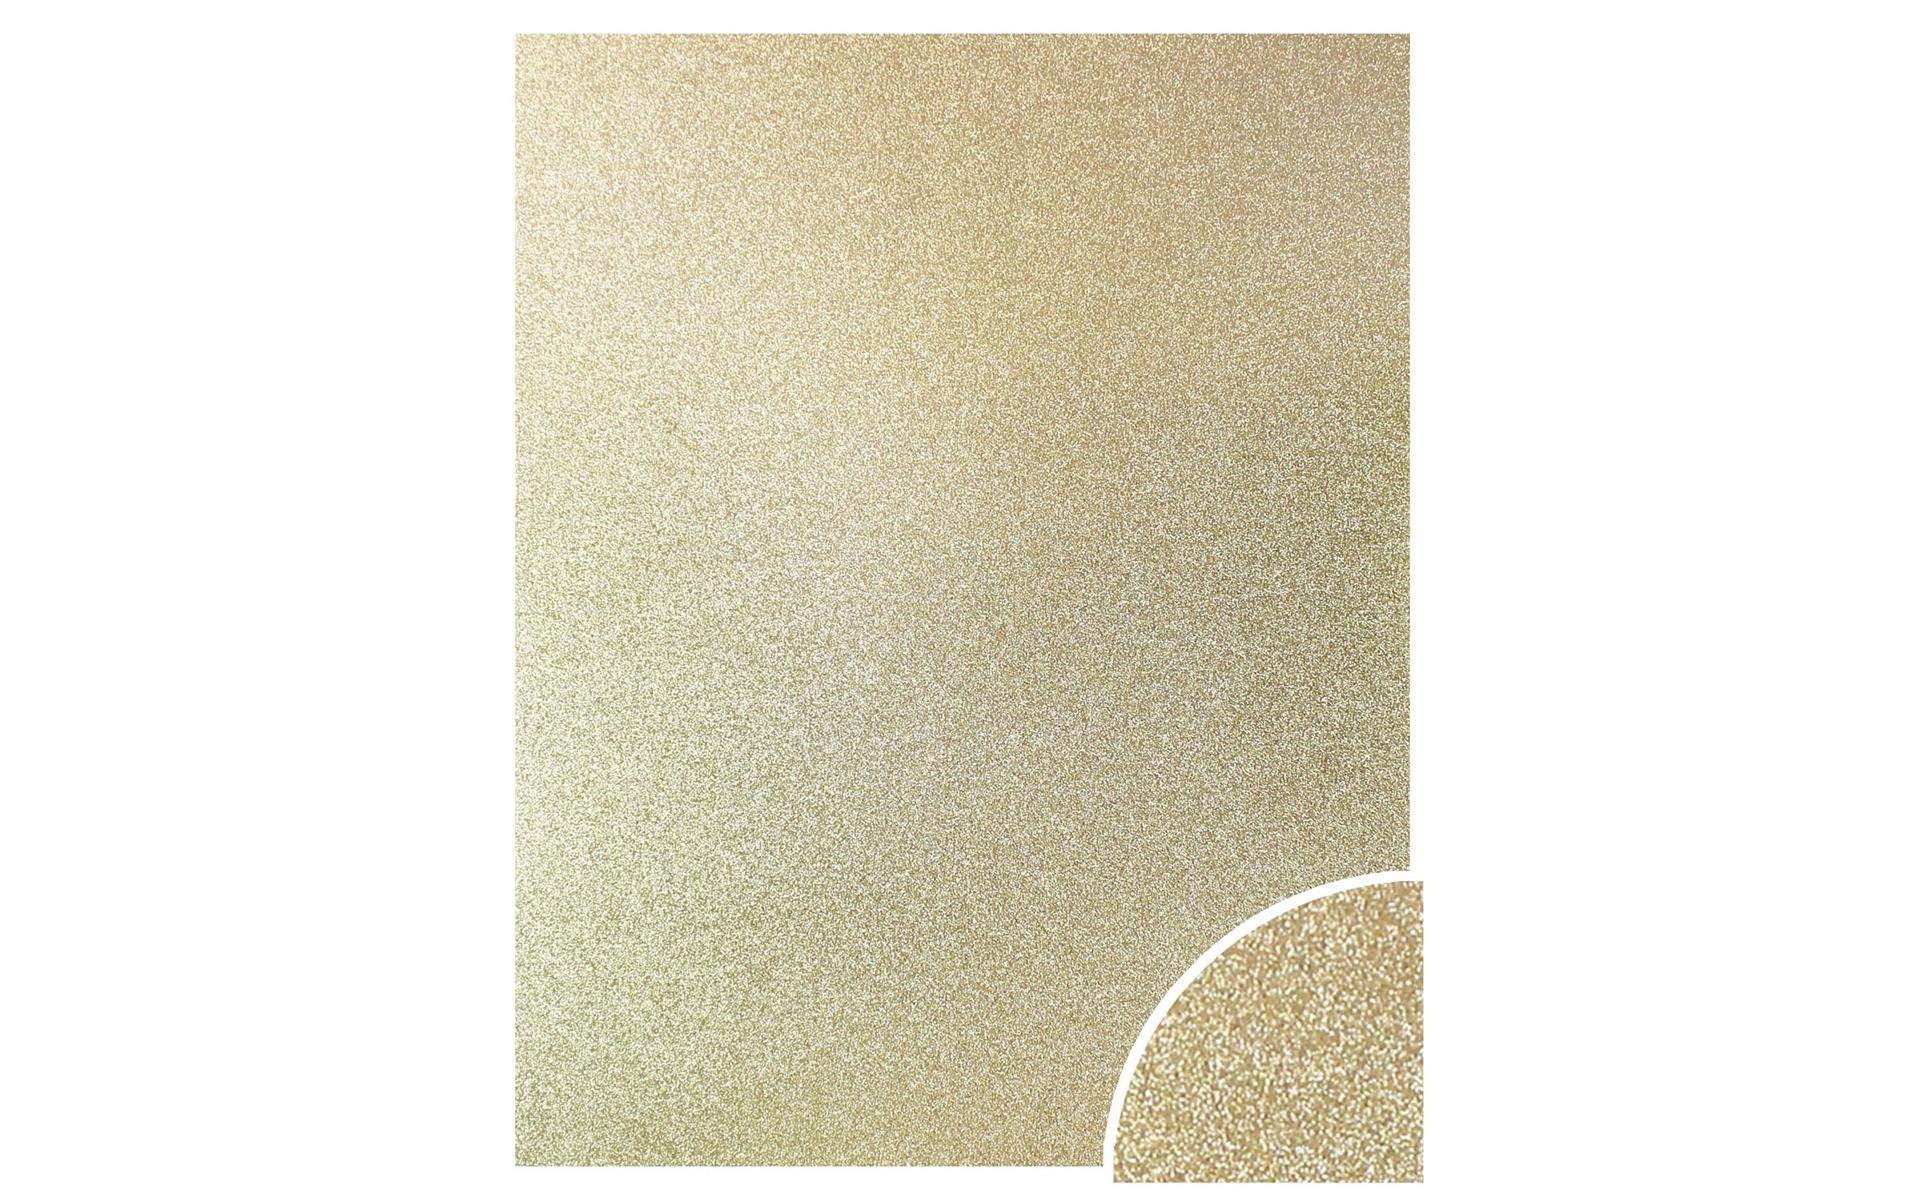 Paper Accents Cdstk Glitter 22x28 85lb Light Gold UPC